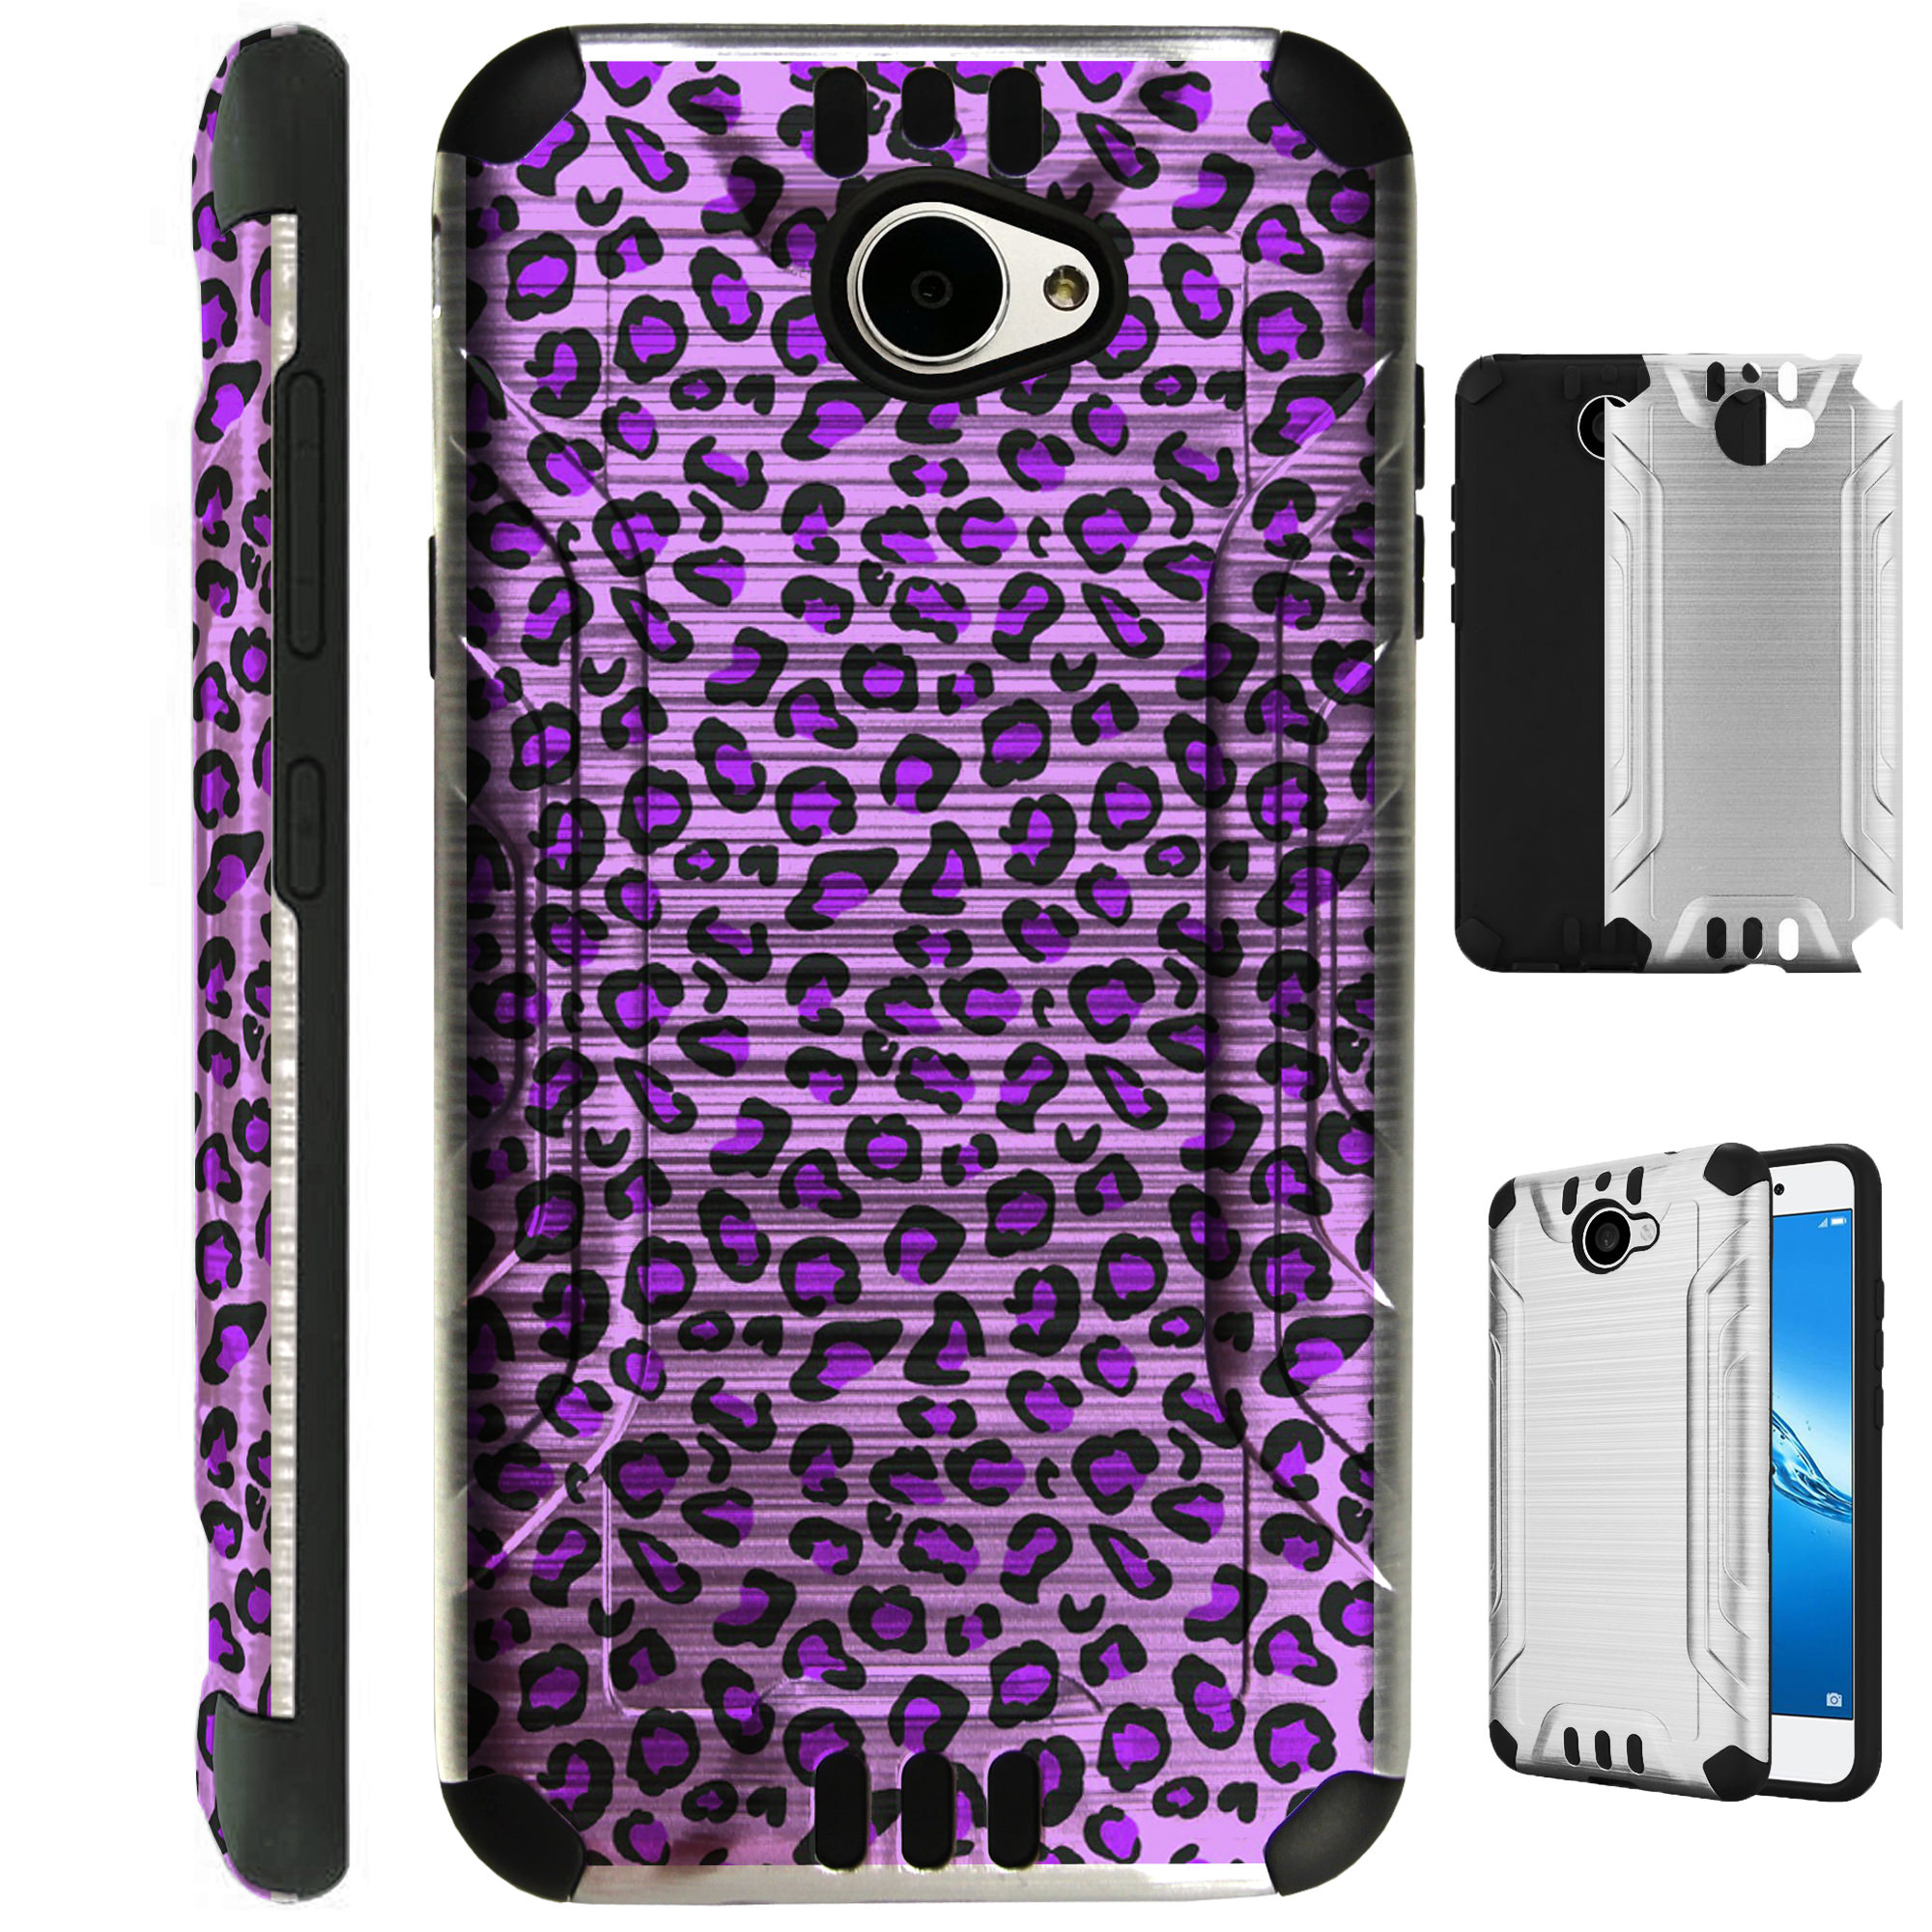 For Huawei Ascend XT2 / Huawei Ascend XT 2 / Huawei Elate 4G Case Brushed Metal Texture Hybrid TPU Metallic Guard Plastic Phone Cover (Purple Leopard Skin)